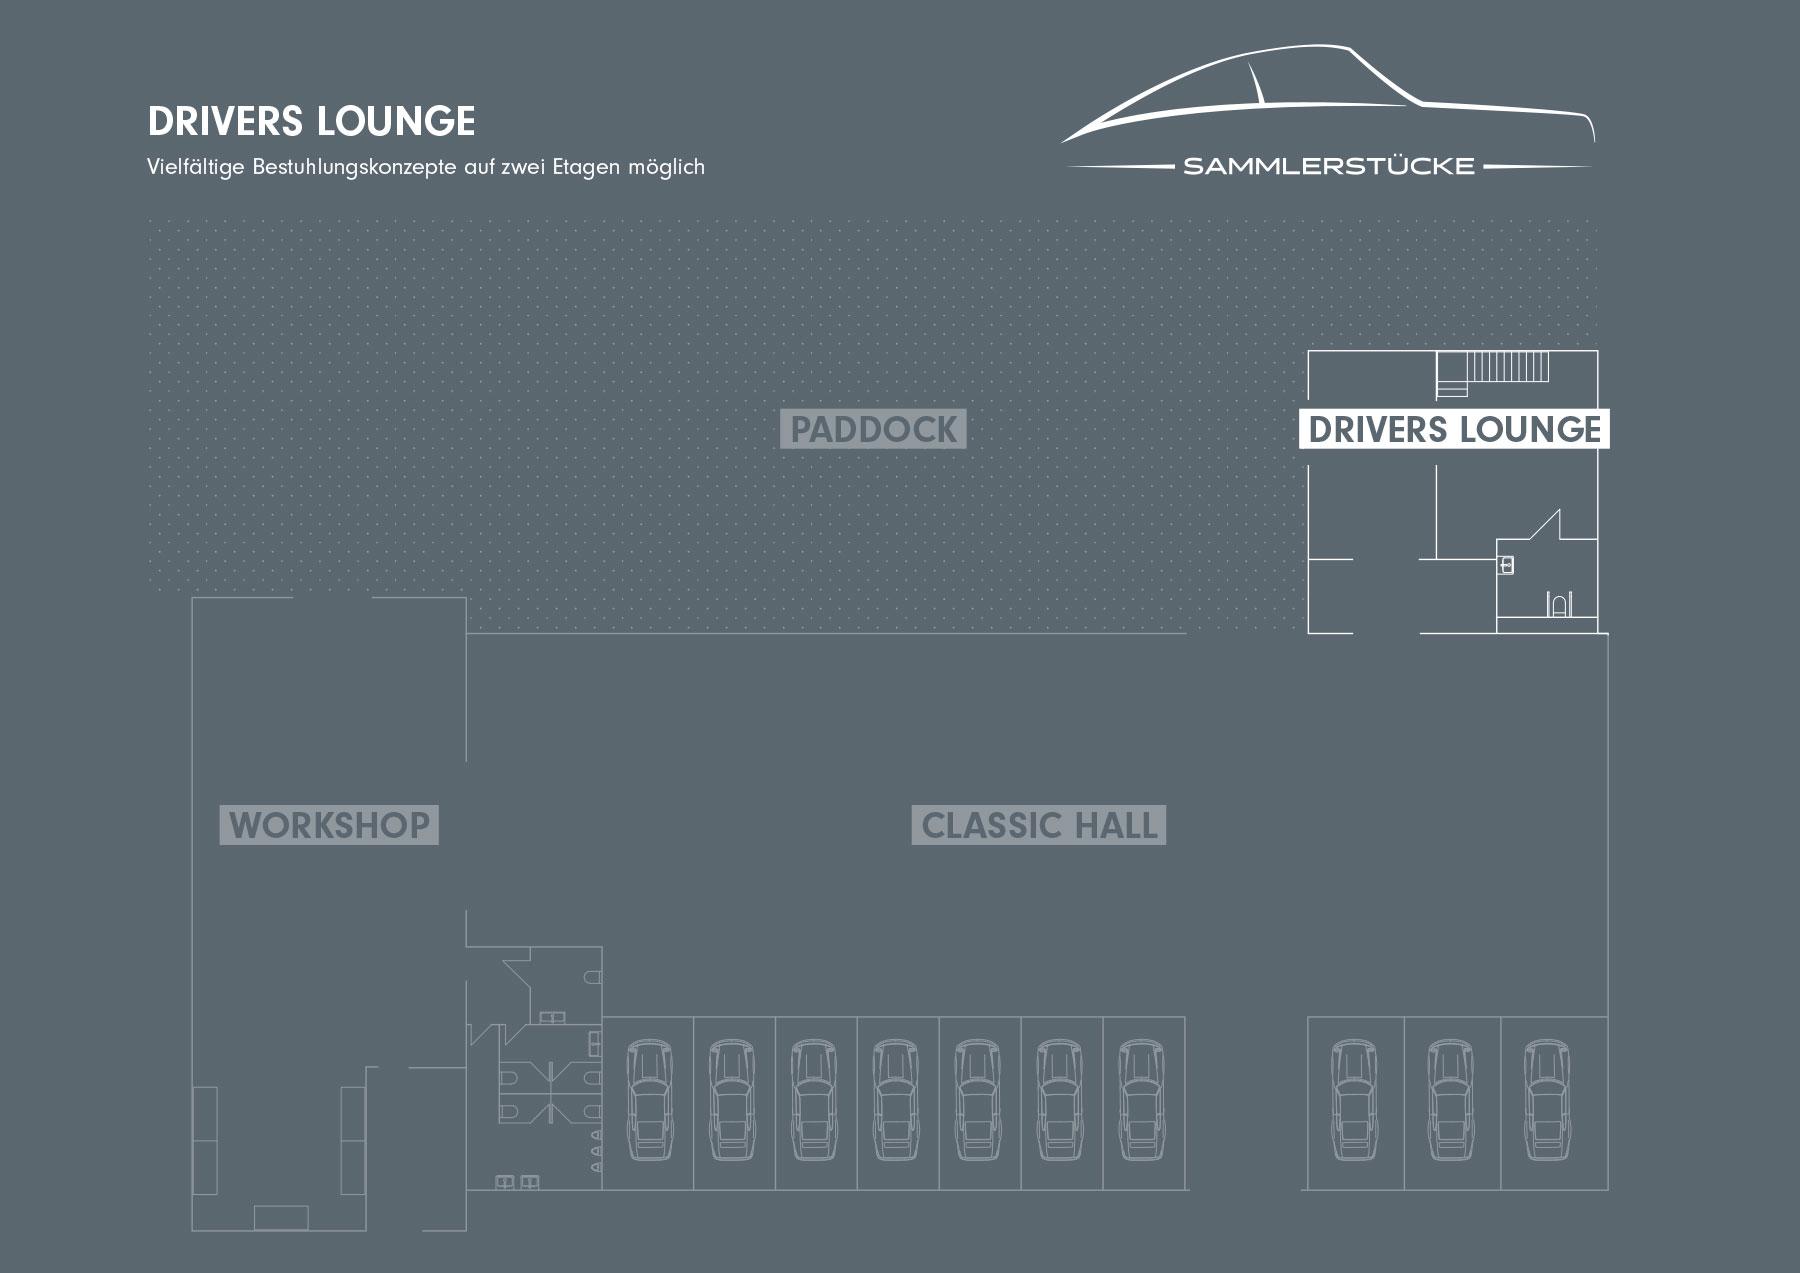 Drivers Lounge – Sammlerstücke Moers